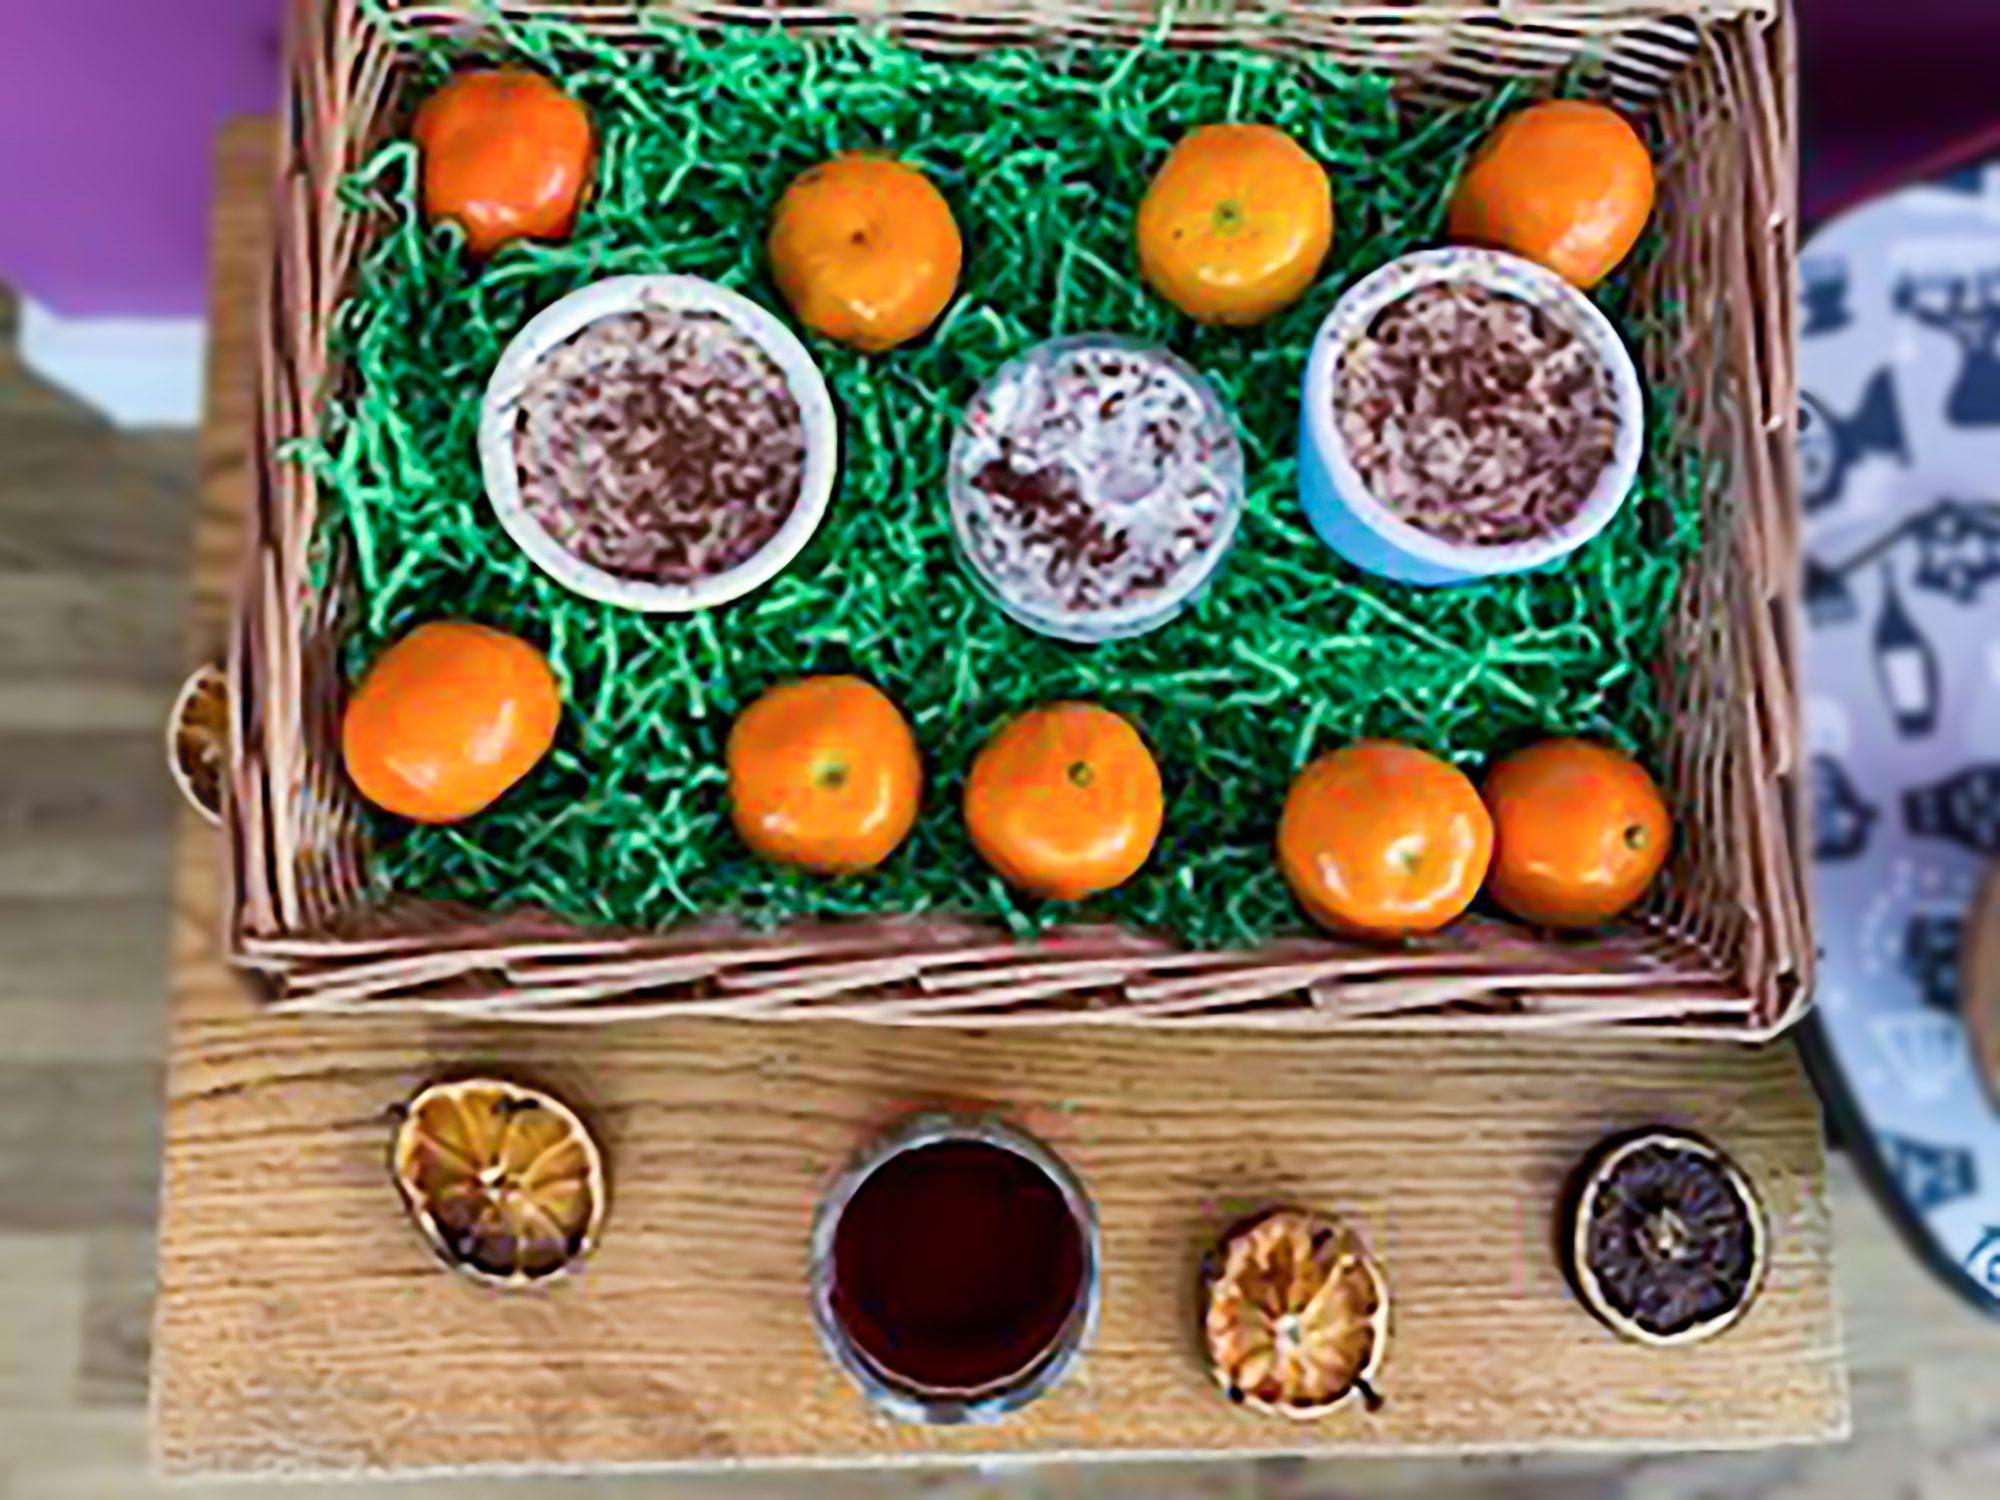 A basket of satumas and hot chocolate used during the festive Namaste session